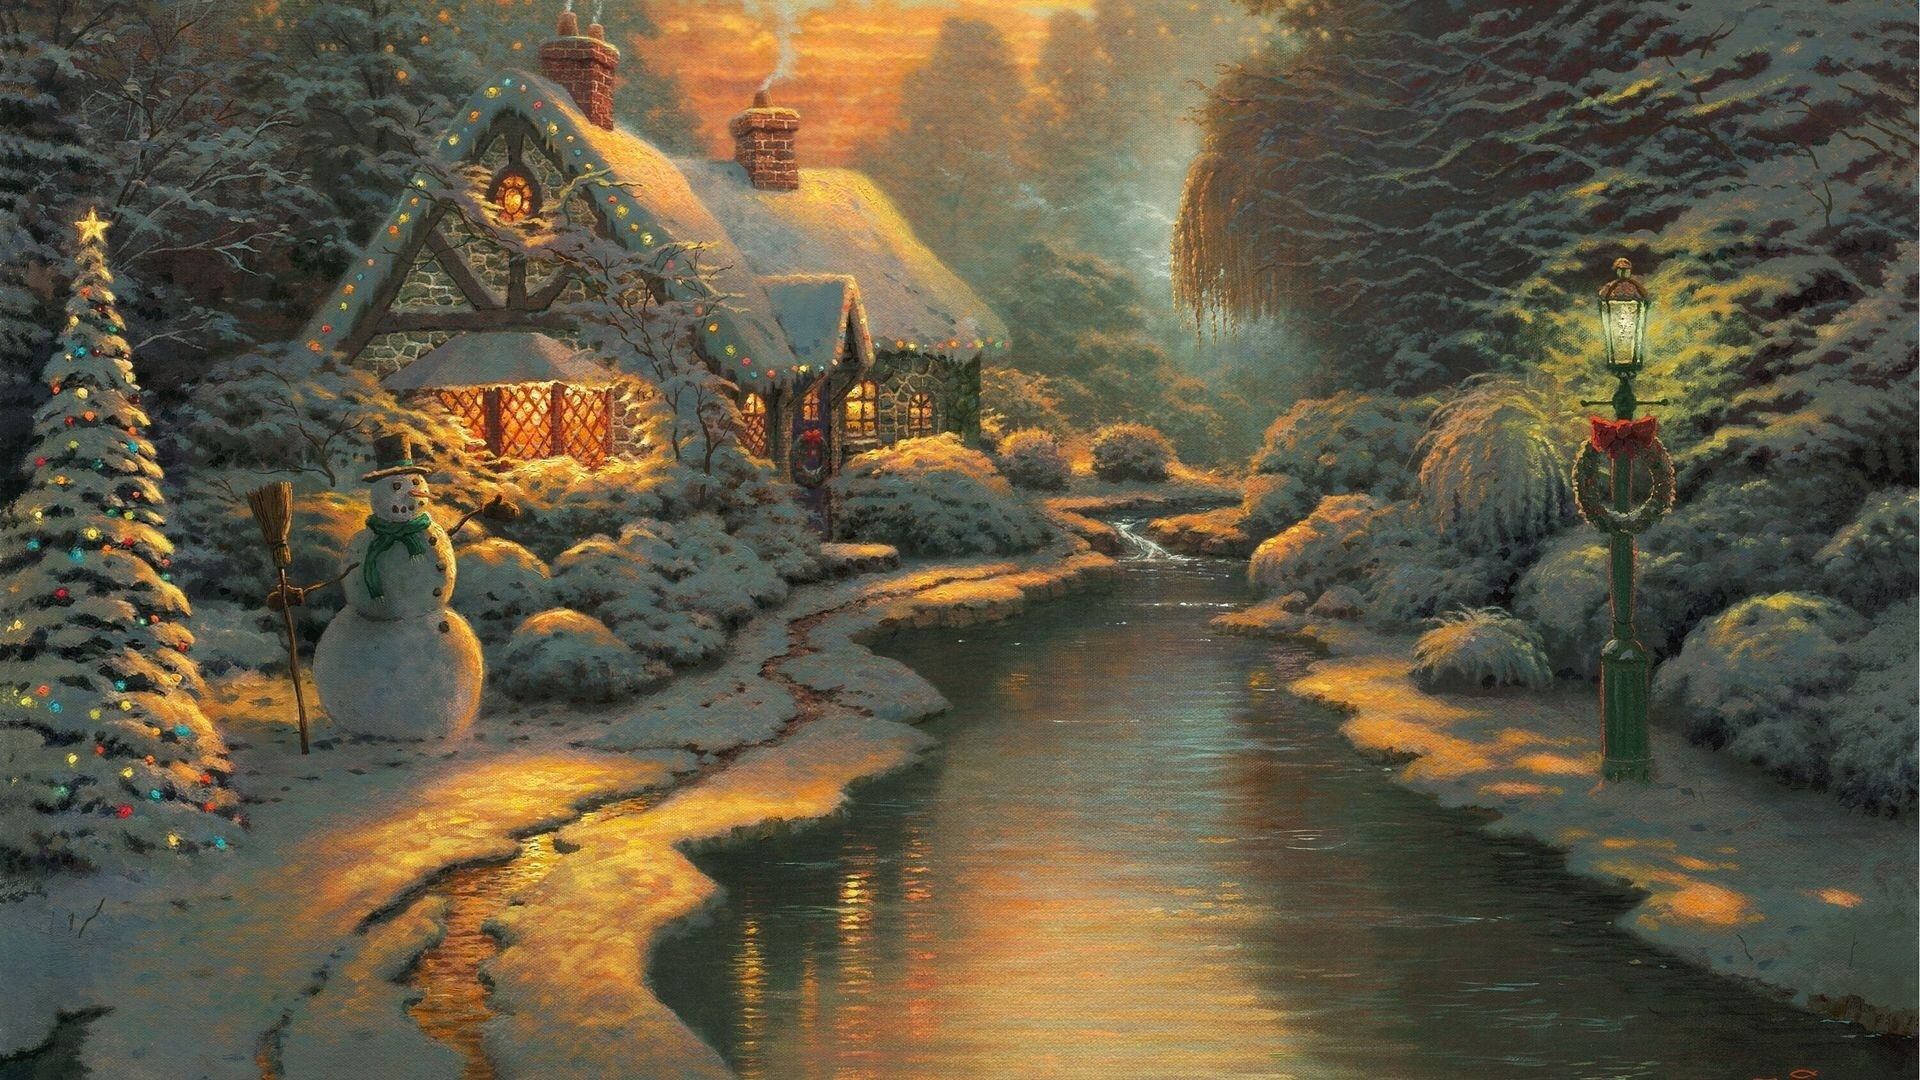 1920x1080 Christmas Cottage desktop PC and Mac wallpaper 1920x1080